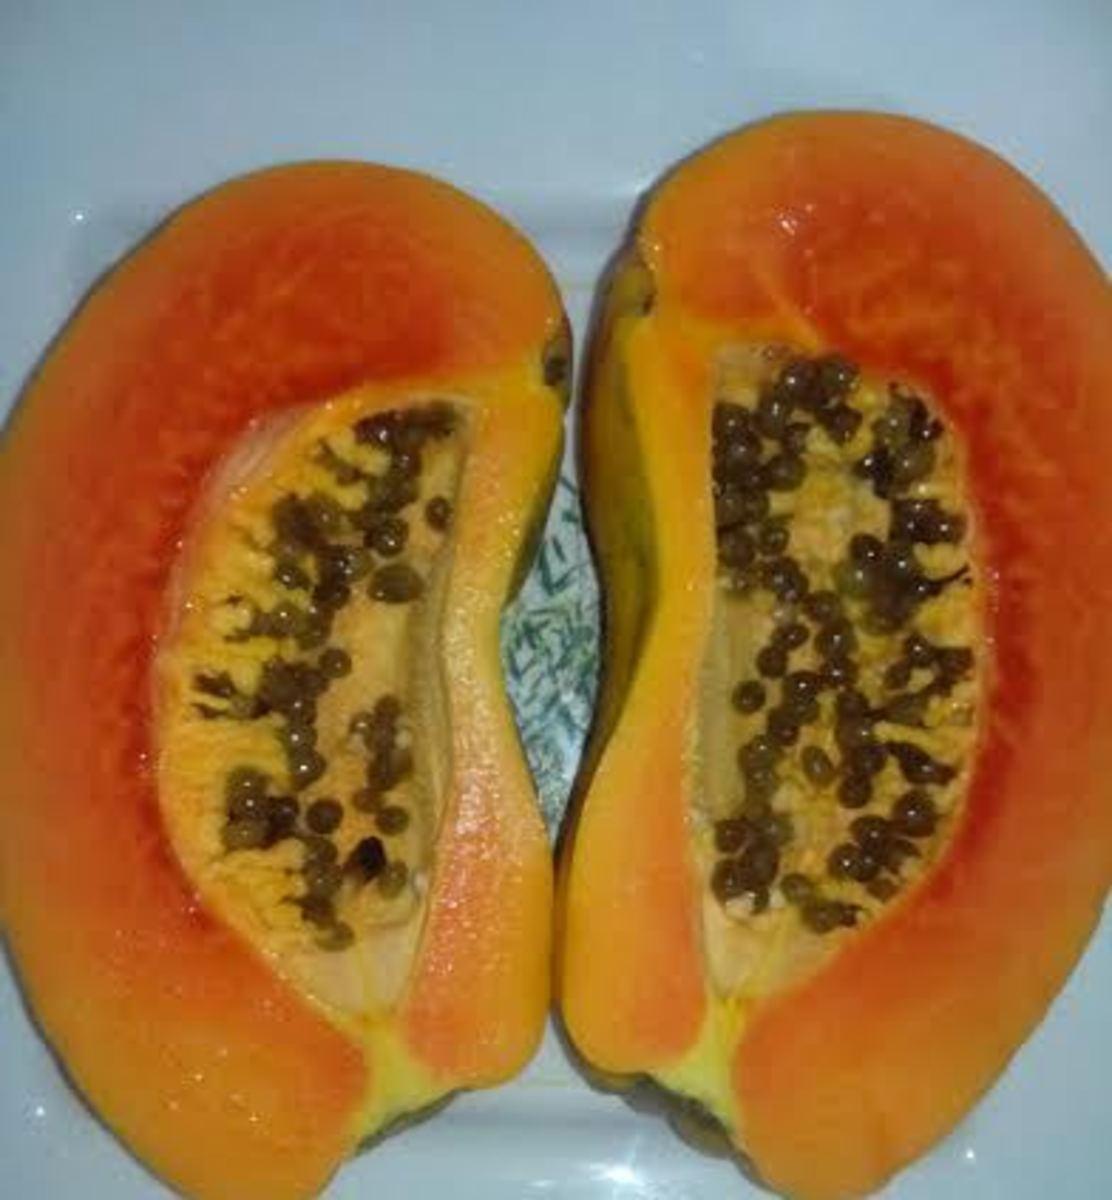 Papaya cut into halves